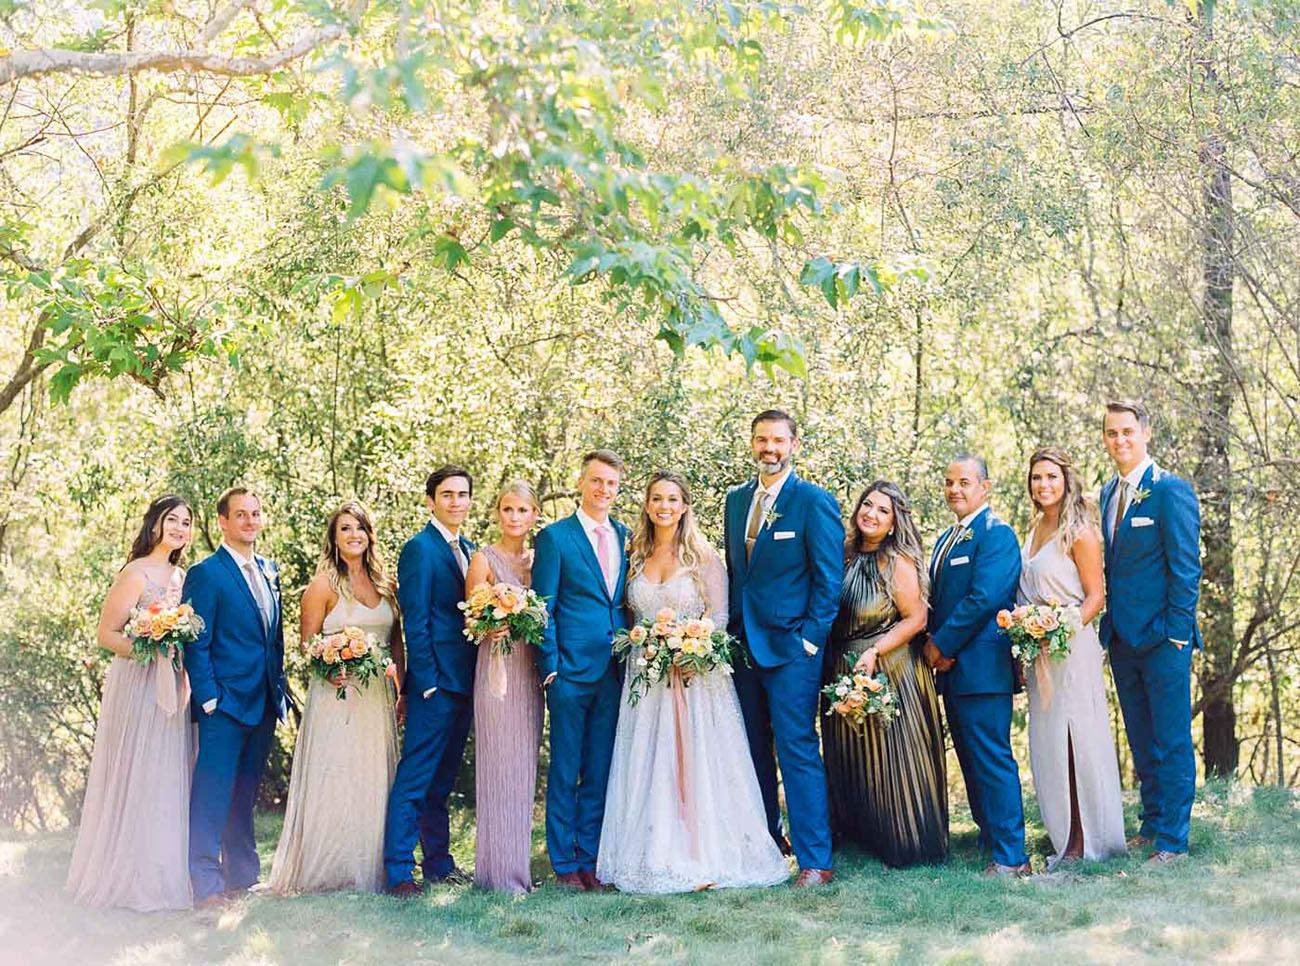 Outdoor Moon & Stars Wedding